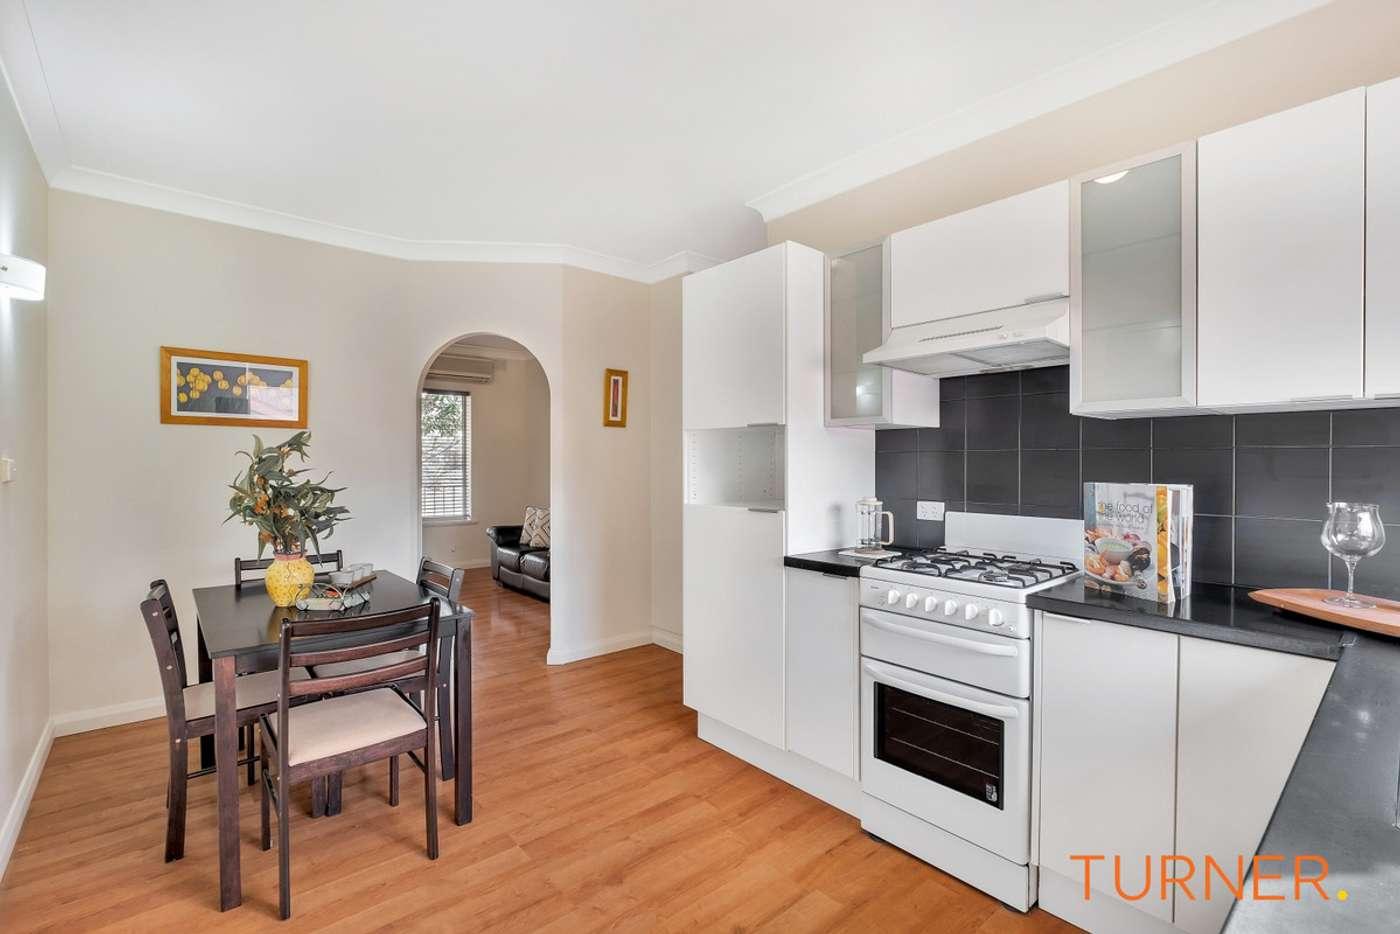 Main view of Homely unit listing, 8/22-24 Charles Street, Norwood SA 5067